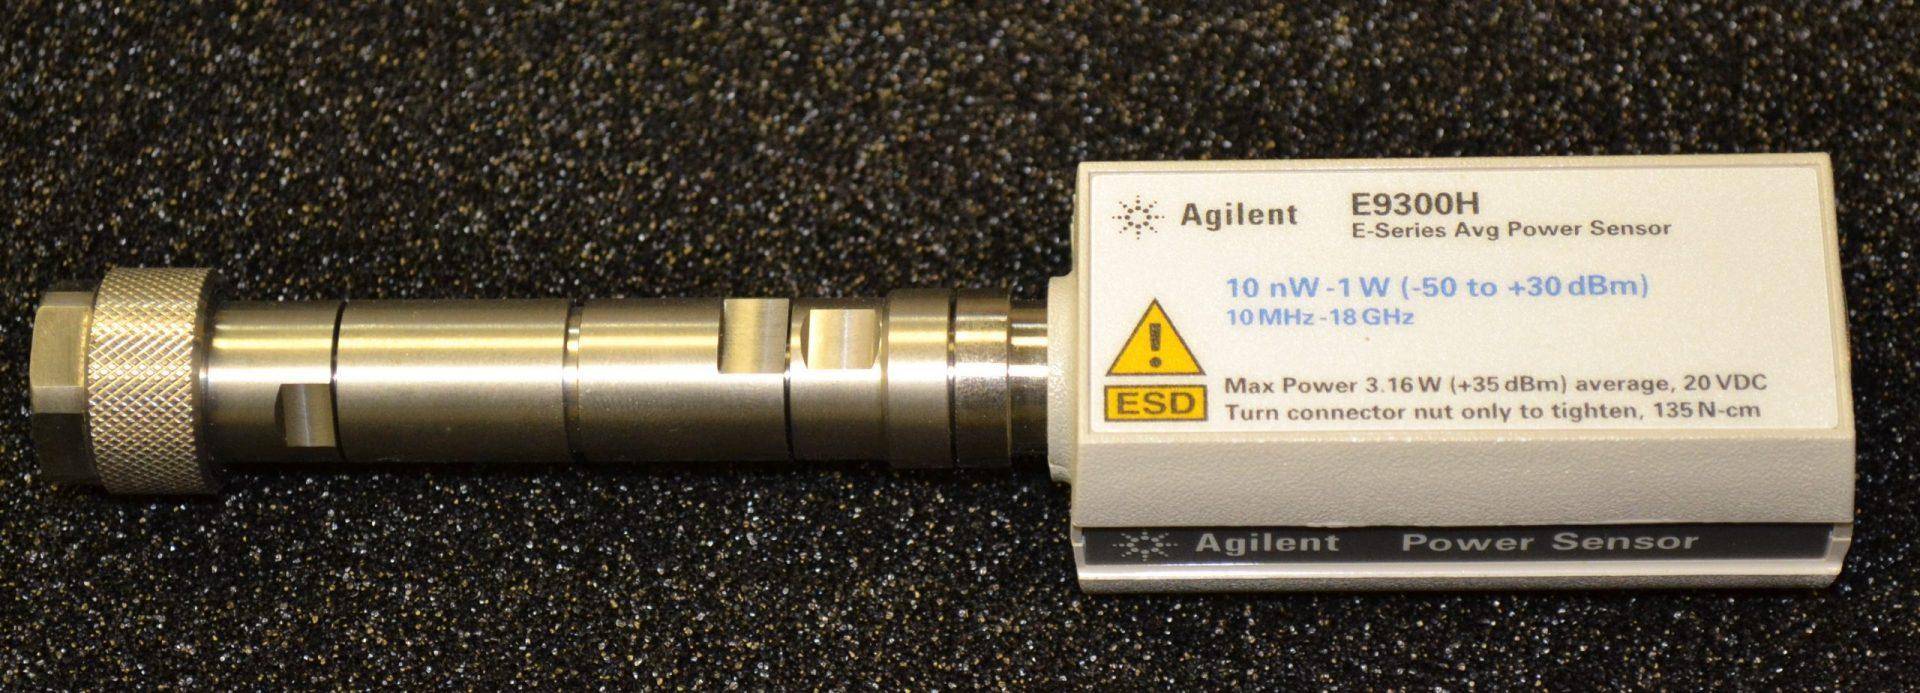 Keysight E9300H Average Power Sensor